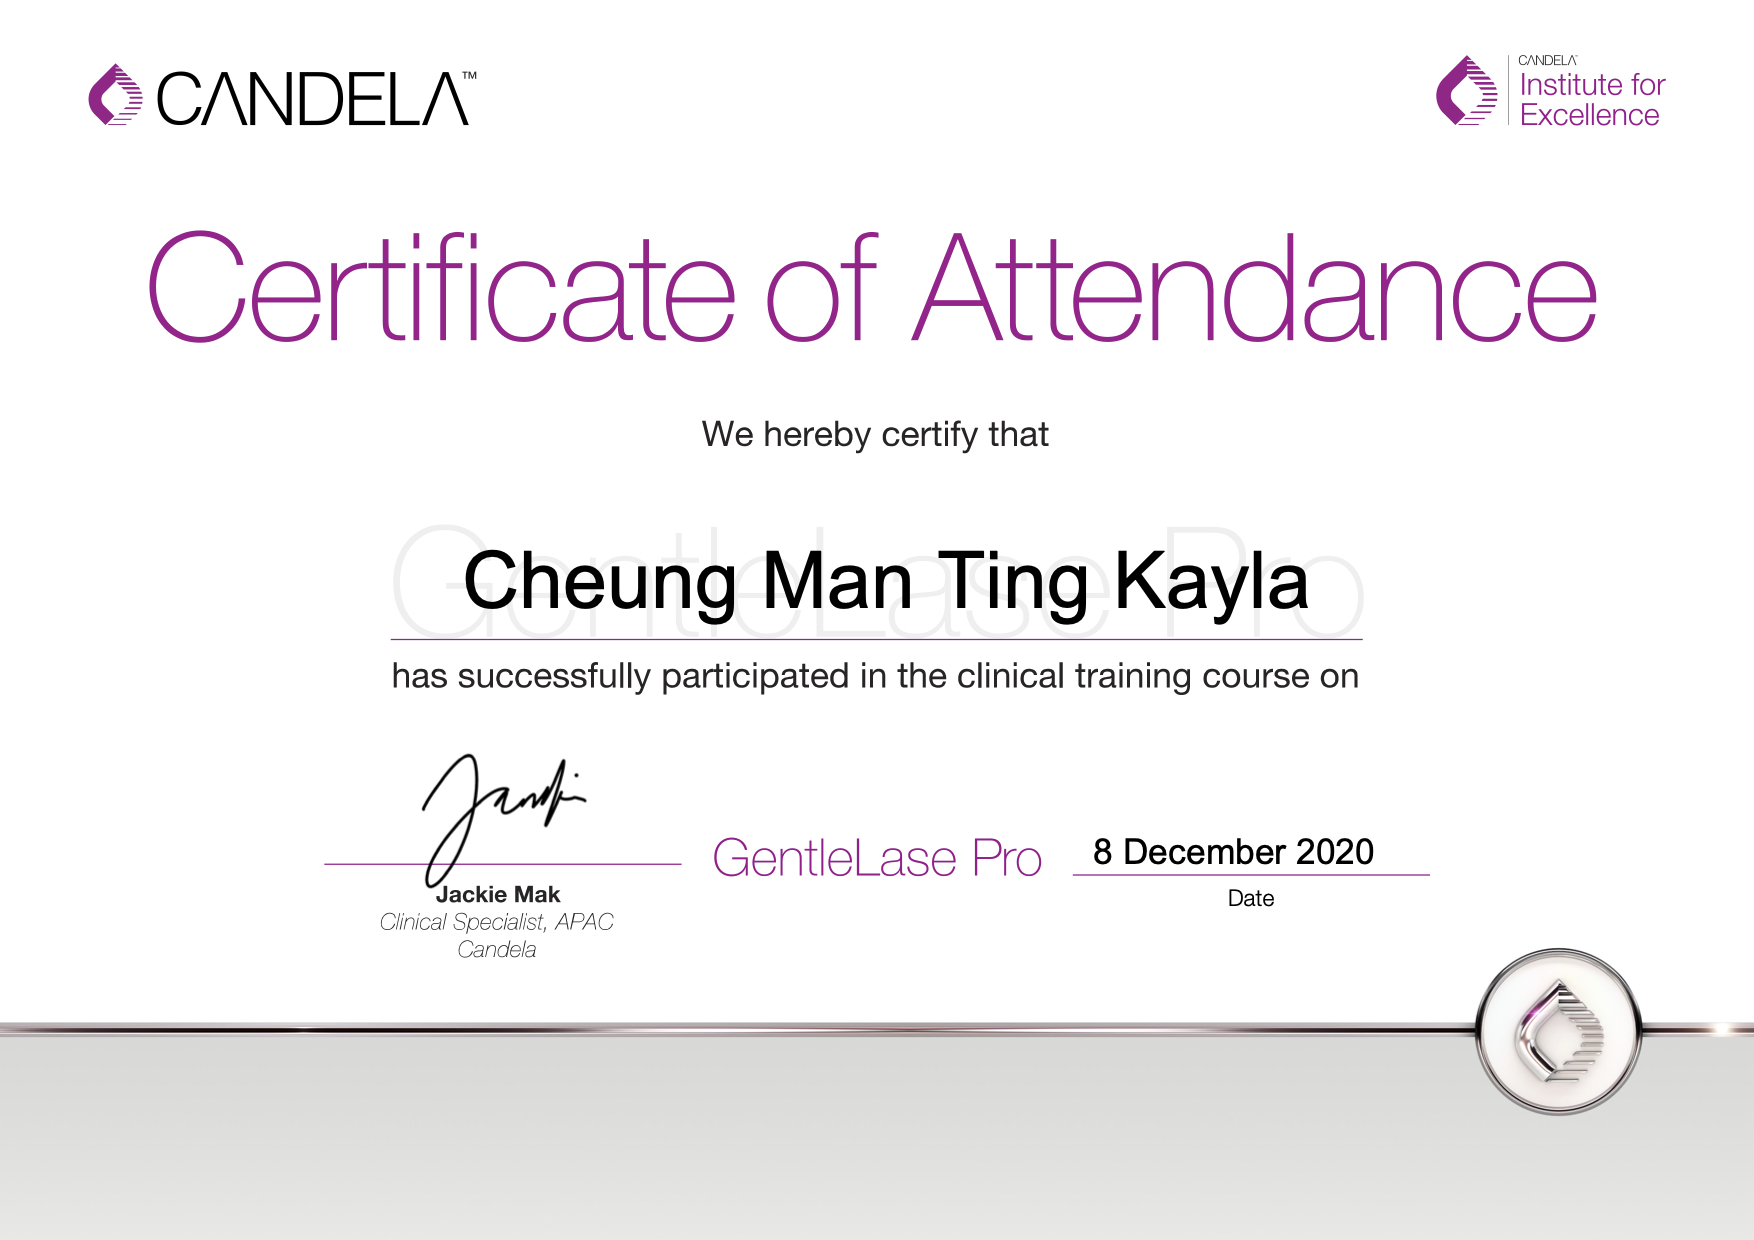 GentleLase_Pro_Certifcate_CheungManTingKayla